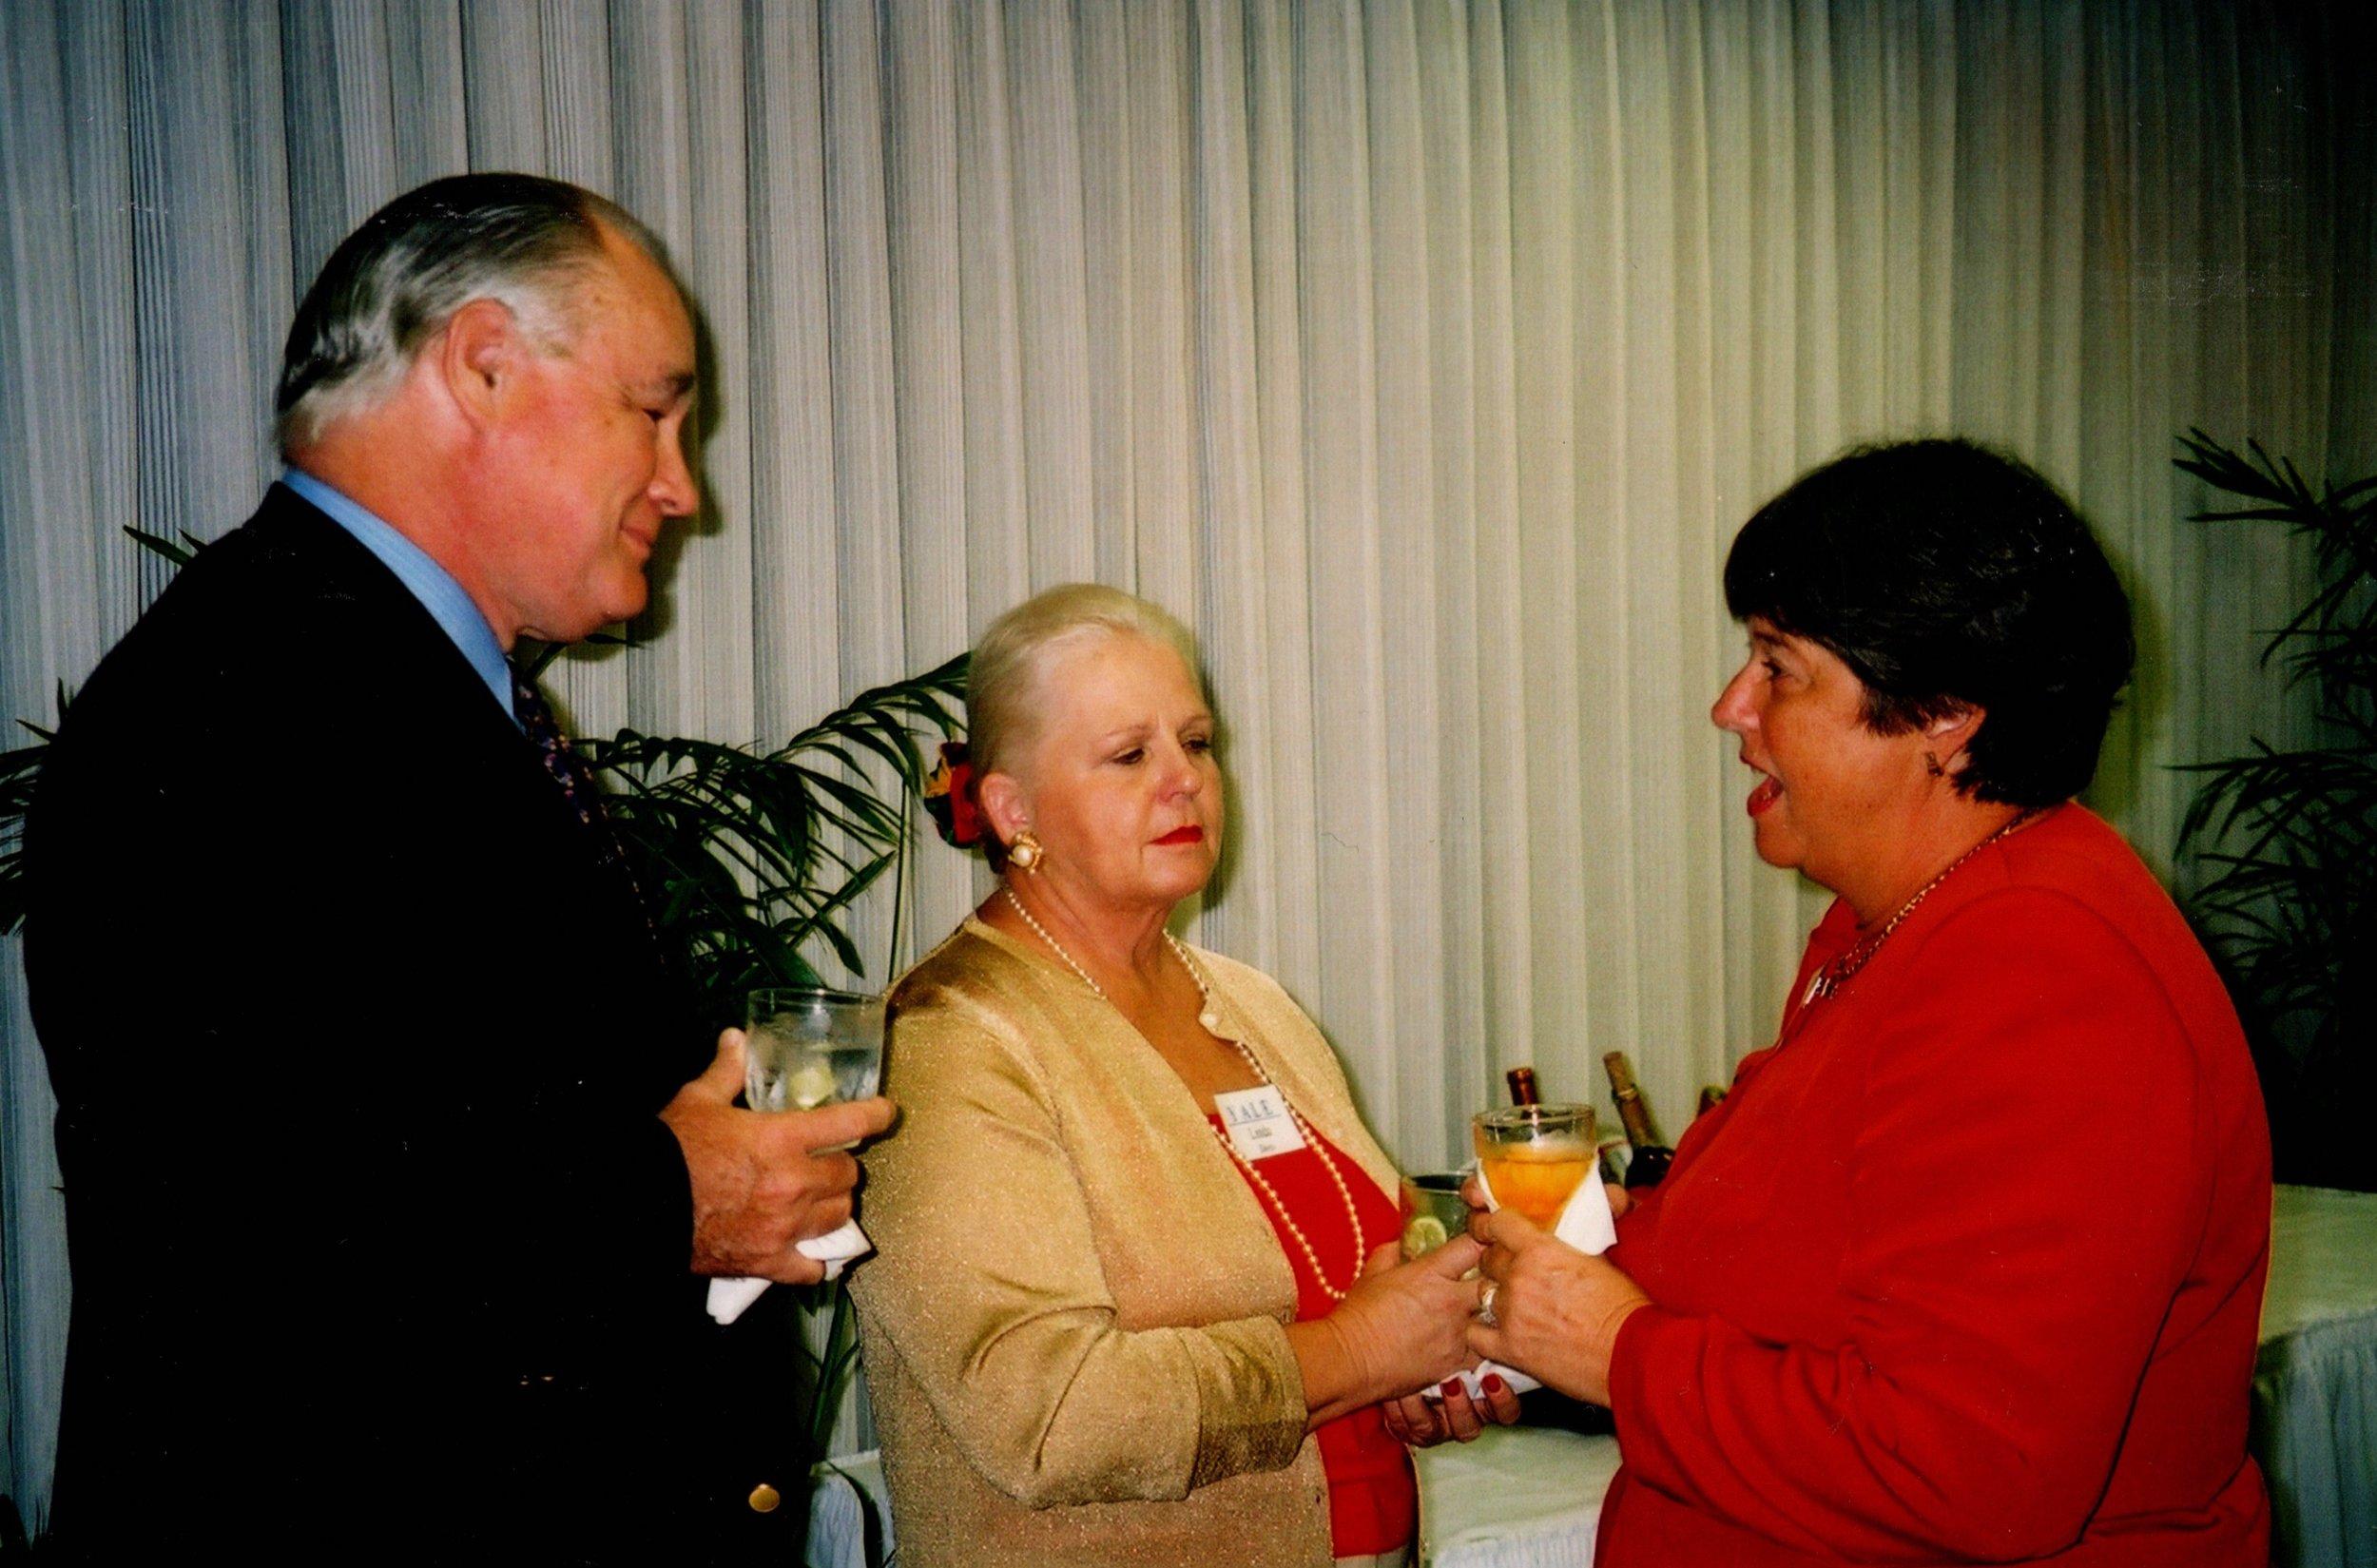 LINDA AND JIM CARTHAUS '62, GEORGIE FOSTER